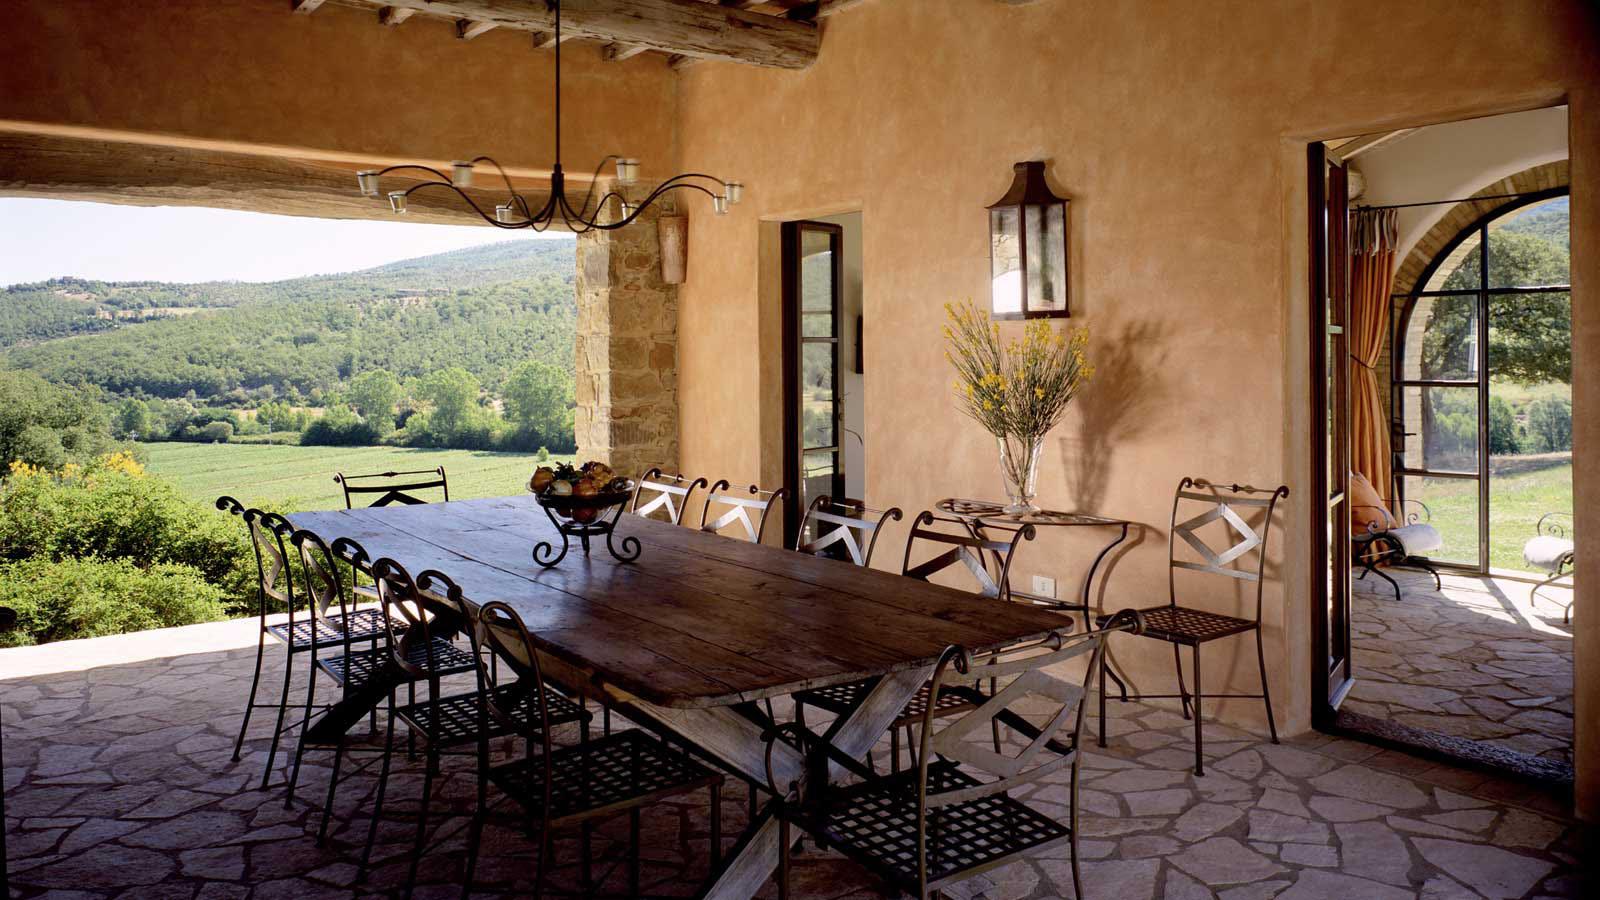 Brusceto castello di reschio - Interior design perugia ...